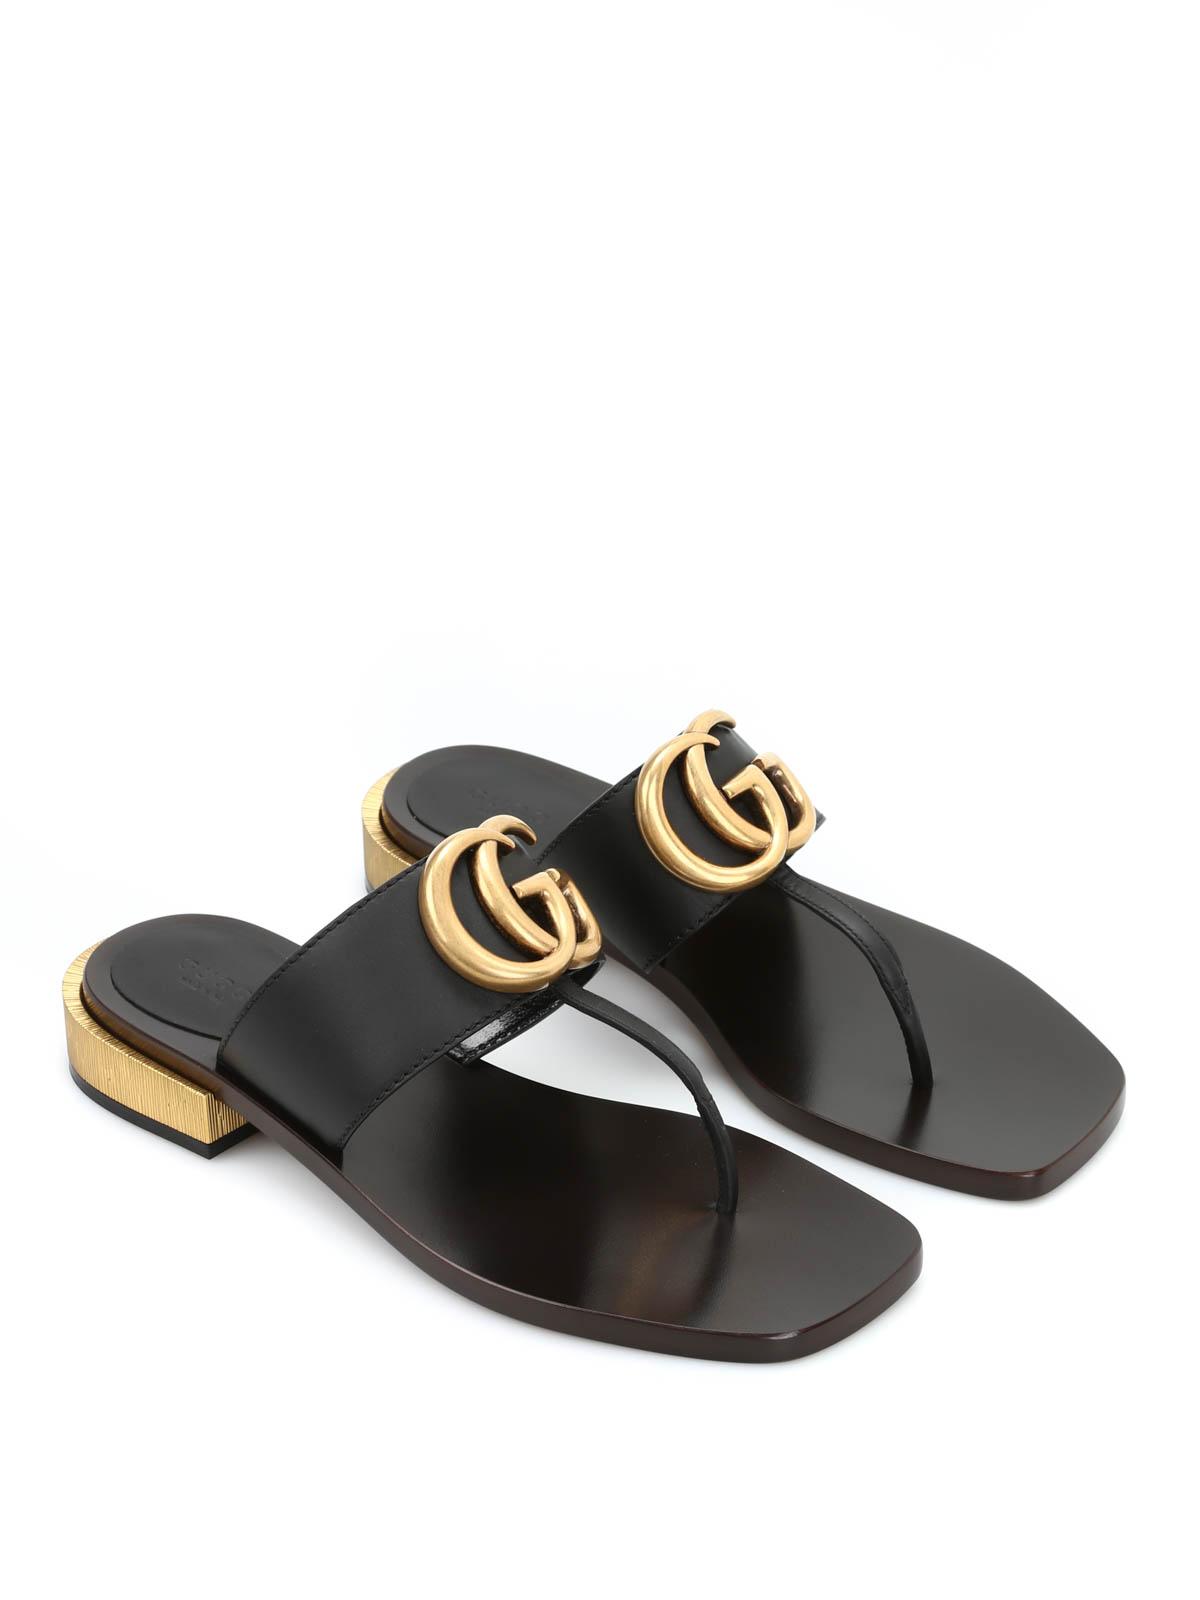 270995e1e2ec71 Gucci - Leather thong sandals - flip flops - 418692 A3N00 1000 ...